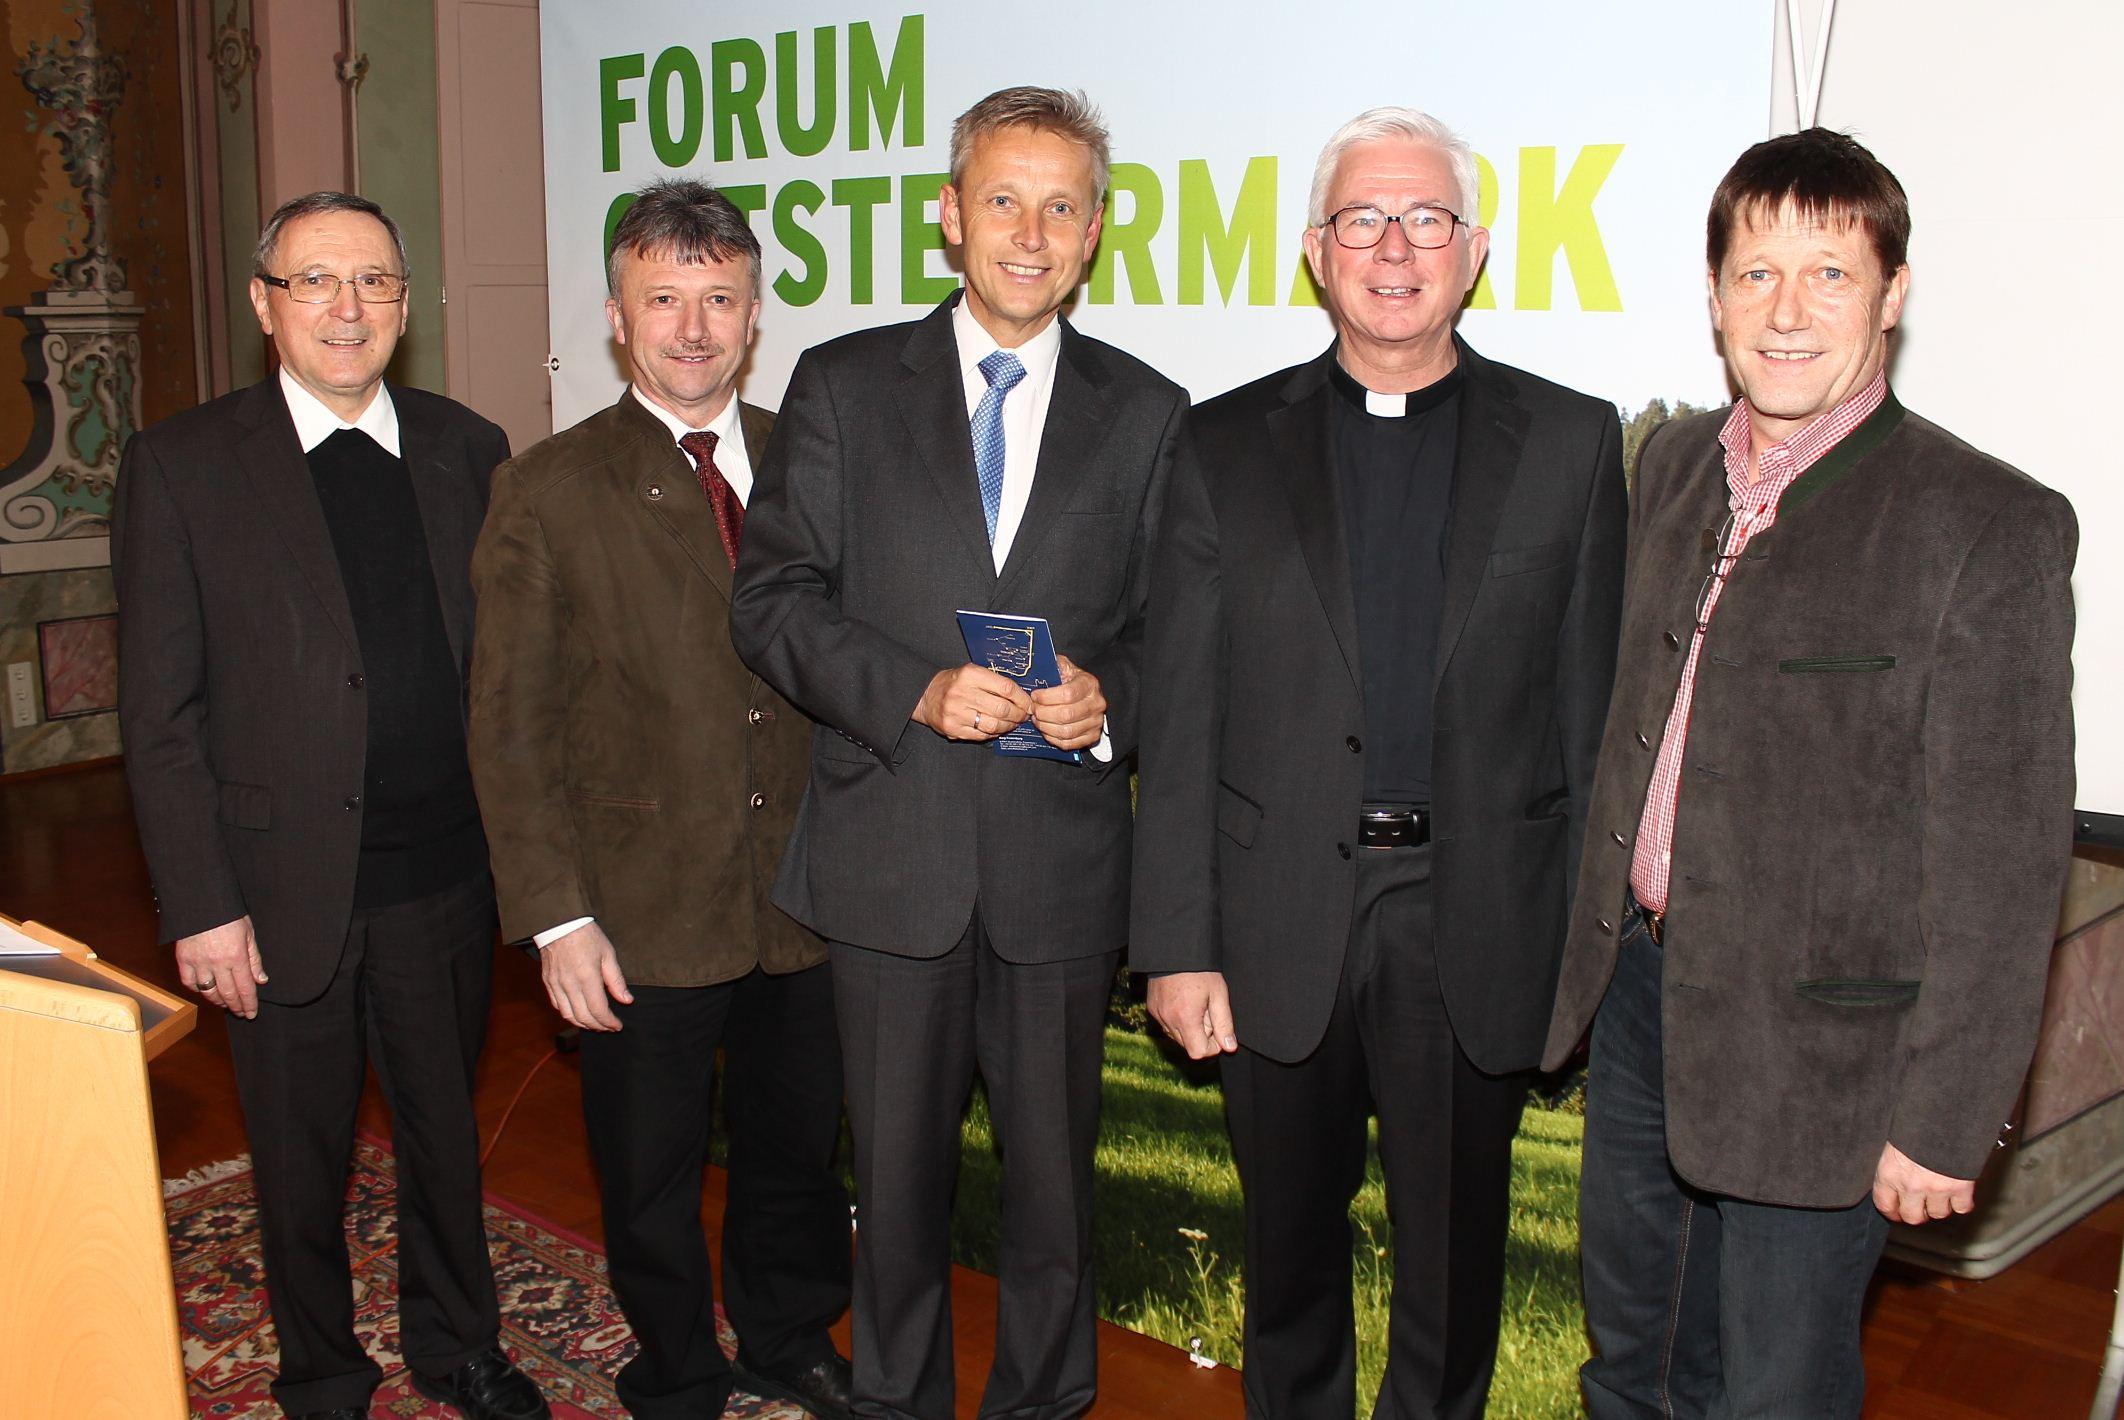 (c) BMEIA, Propst Gerhard Rechberger, LAbg. Hubert Lang, StS Reinhold Lopatka, Weihbischof Franz Lackner, Bgm. Bernhard Spitzer.